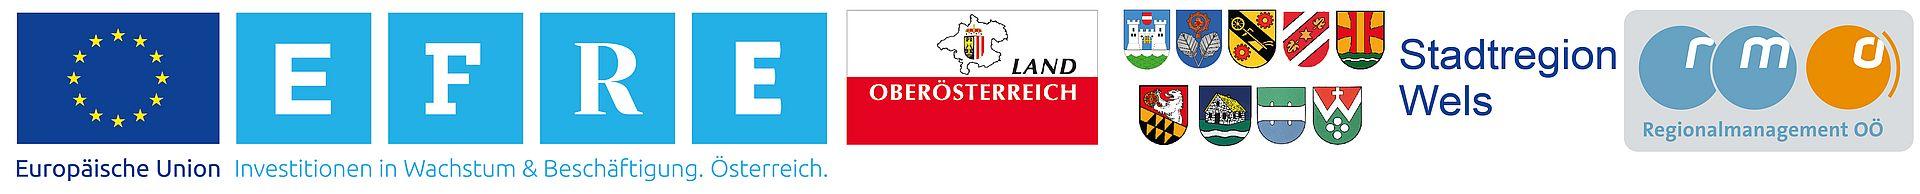 IWB Logoleiste